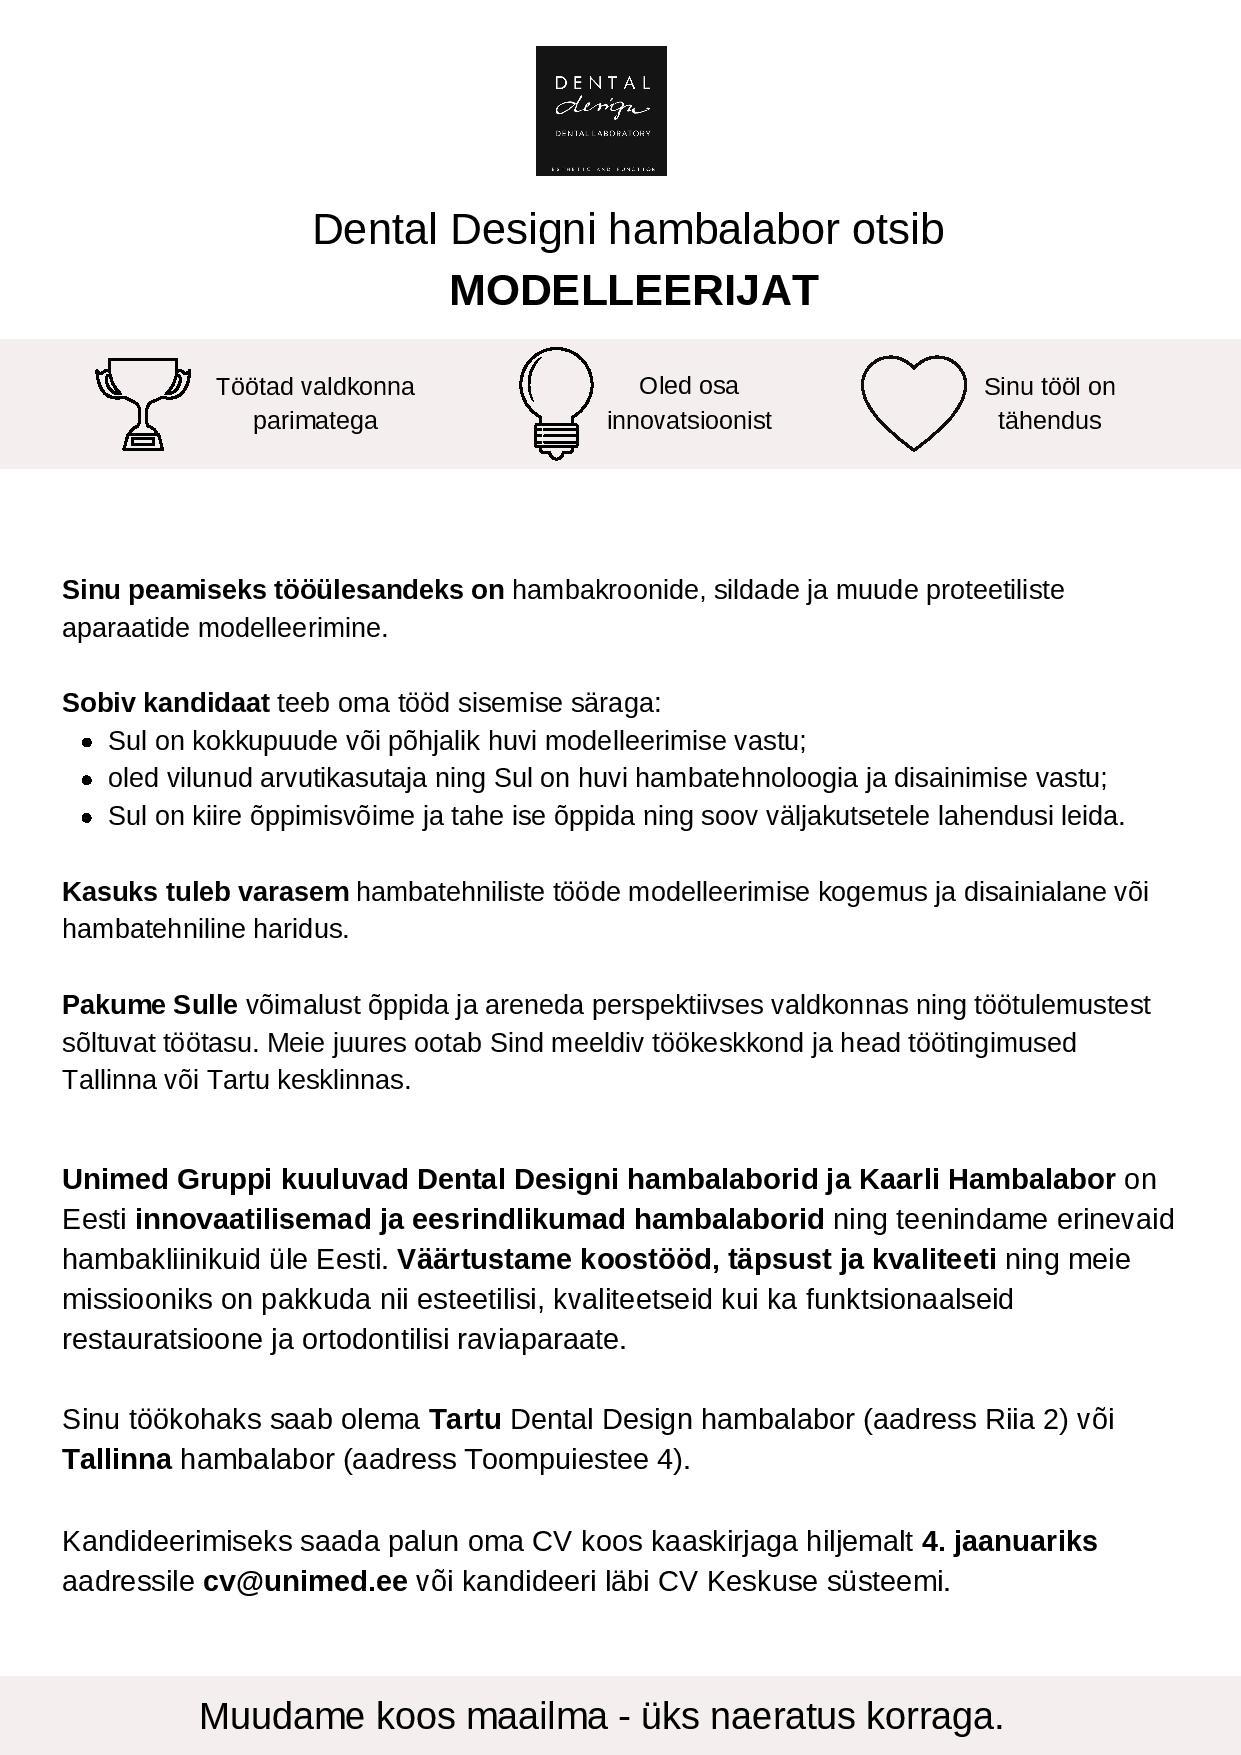 Dental Design Modelleerija-page-001